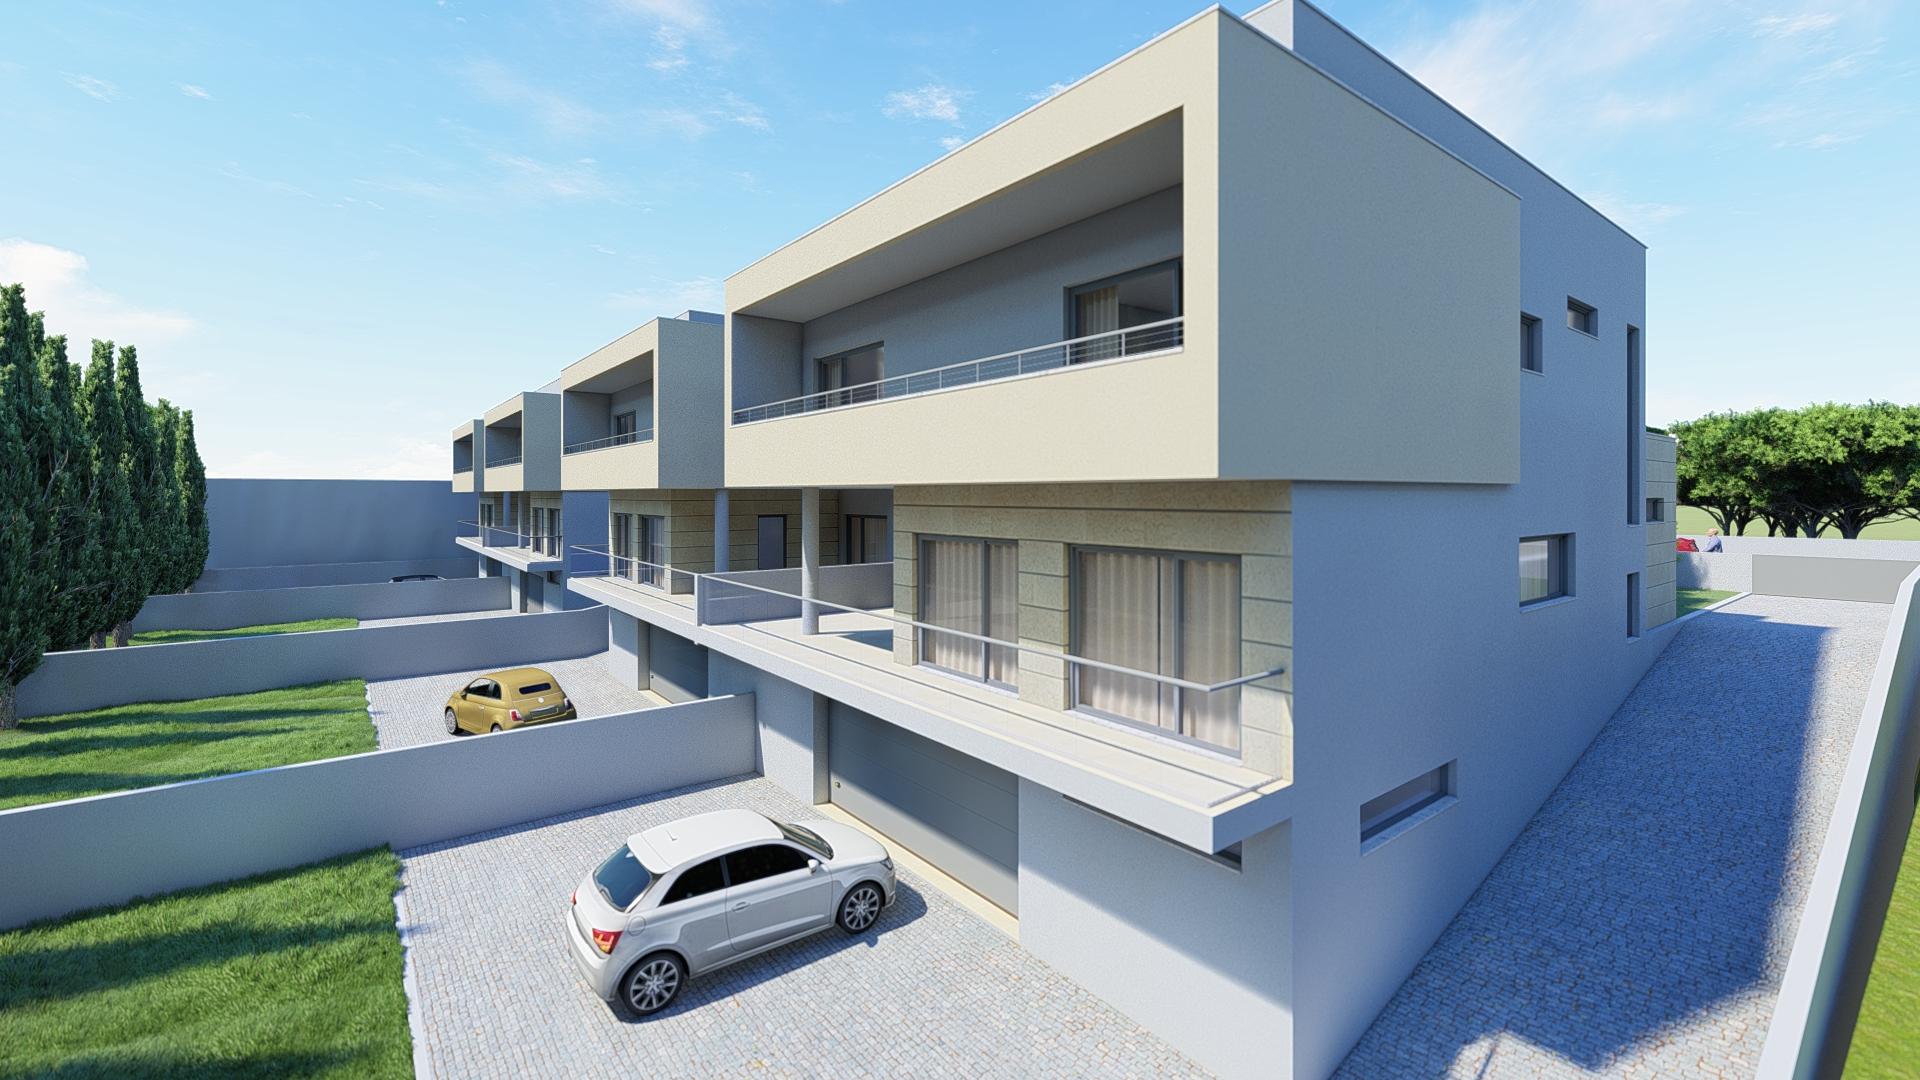 Conjunto Habitacional - Antanhol - Coimbra 0